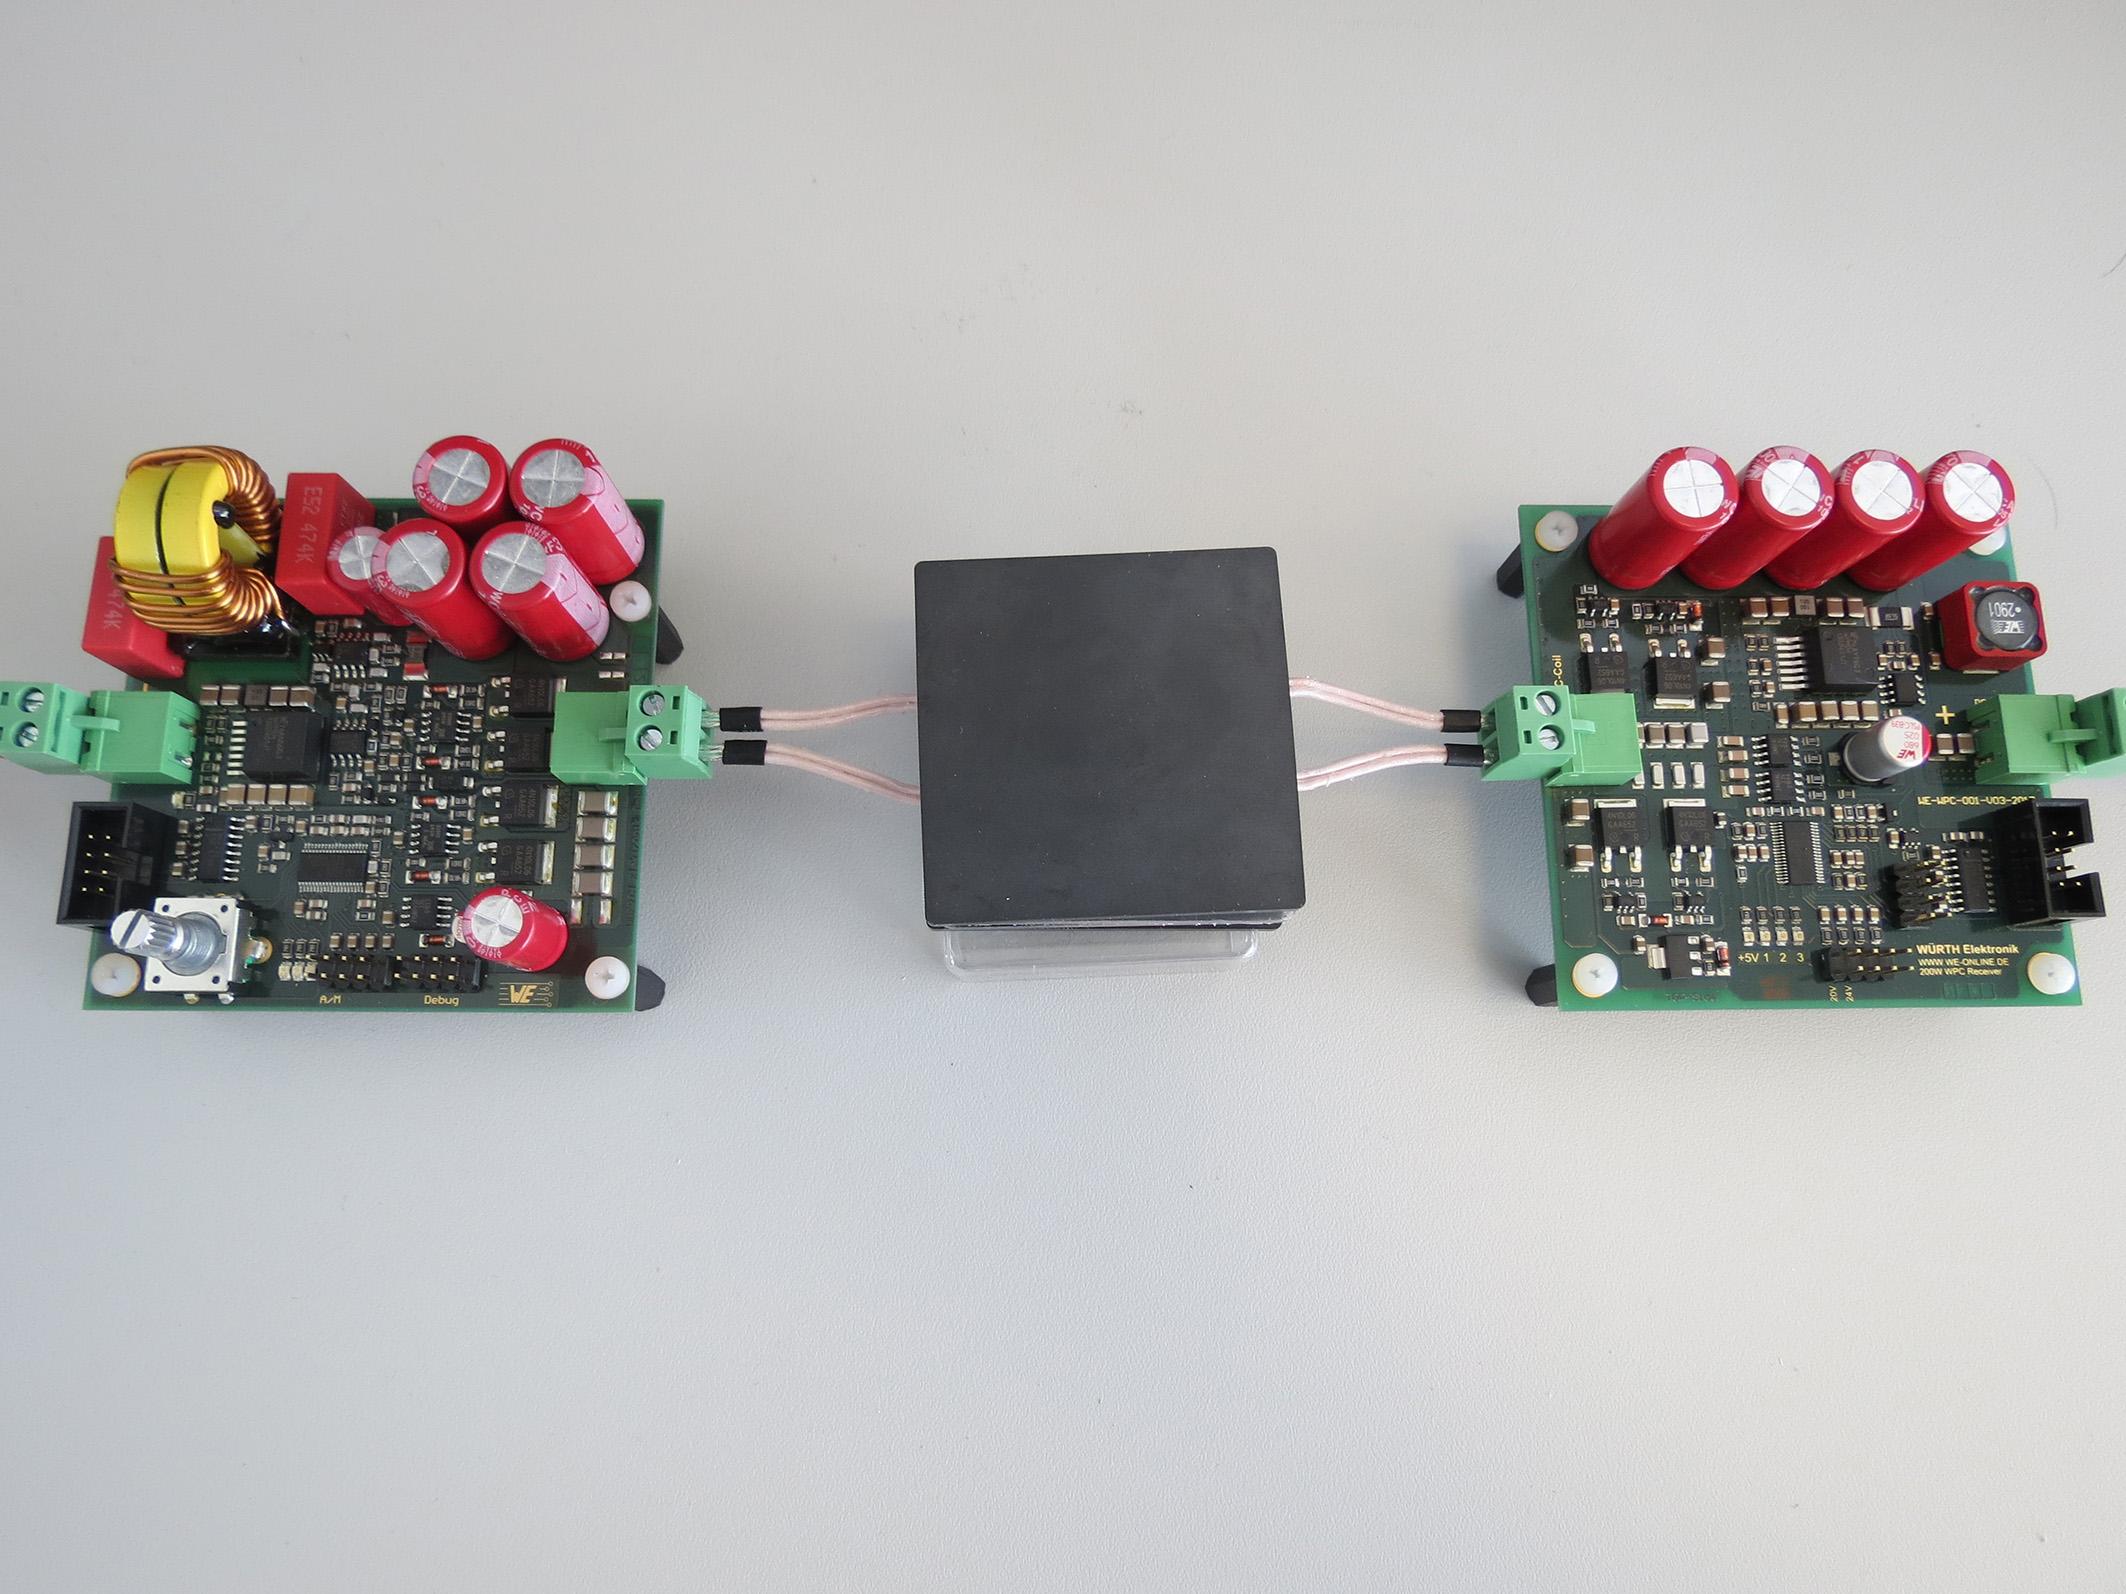 New 200-watt development system: Combining wireless power and data ...